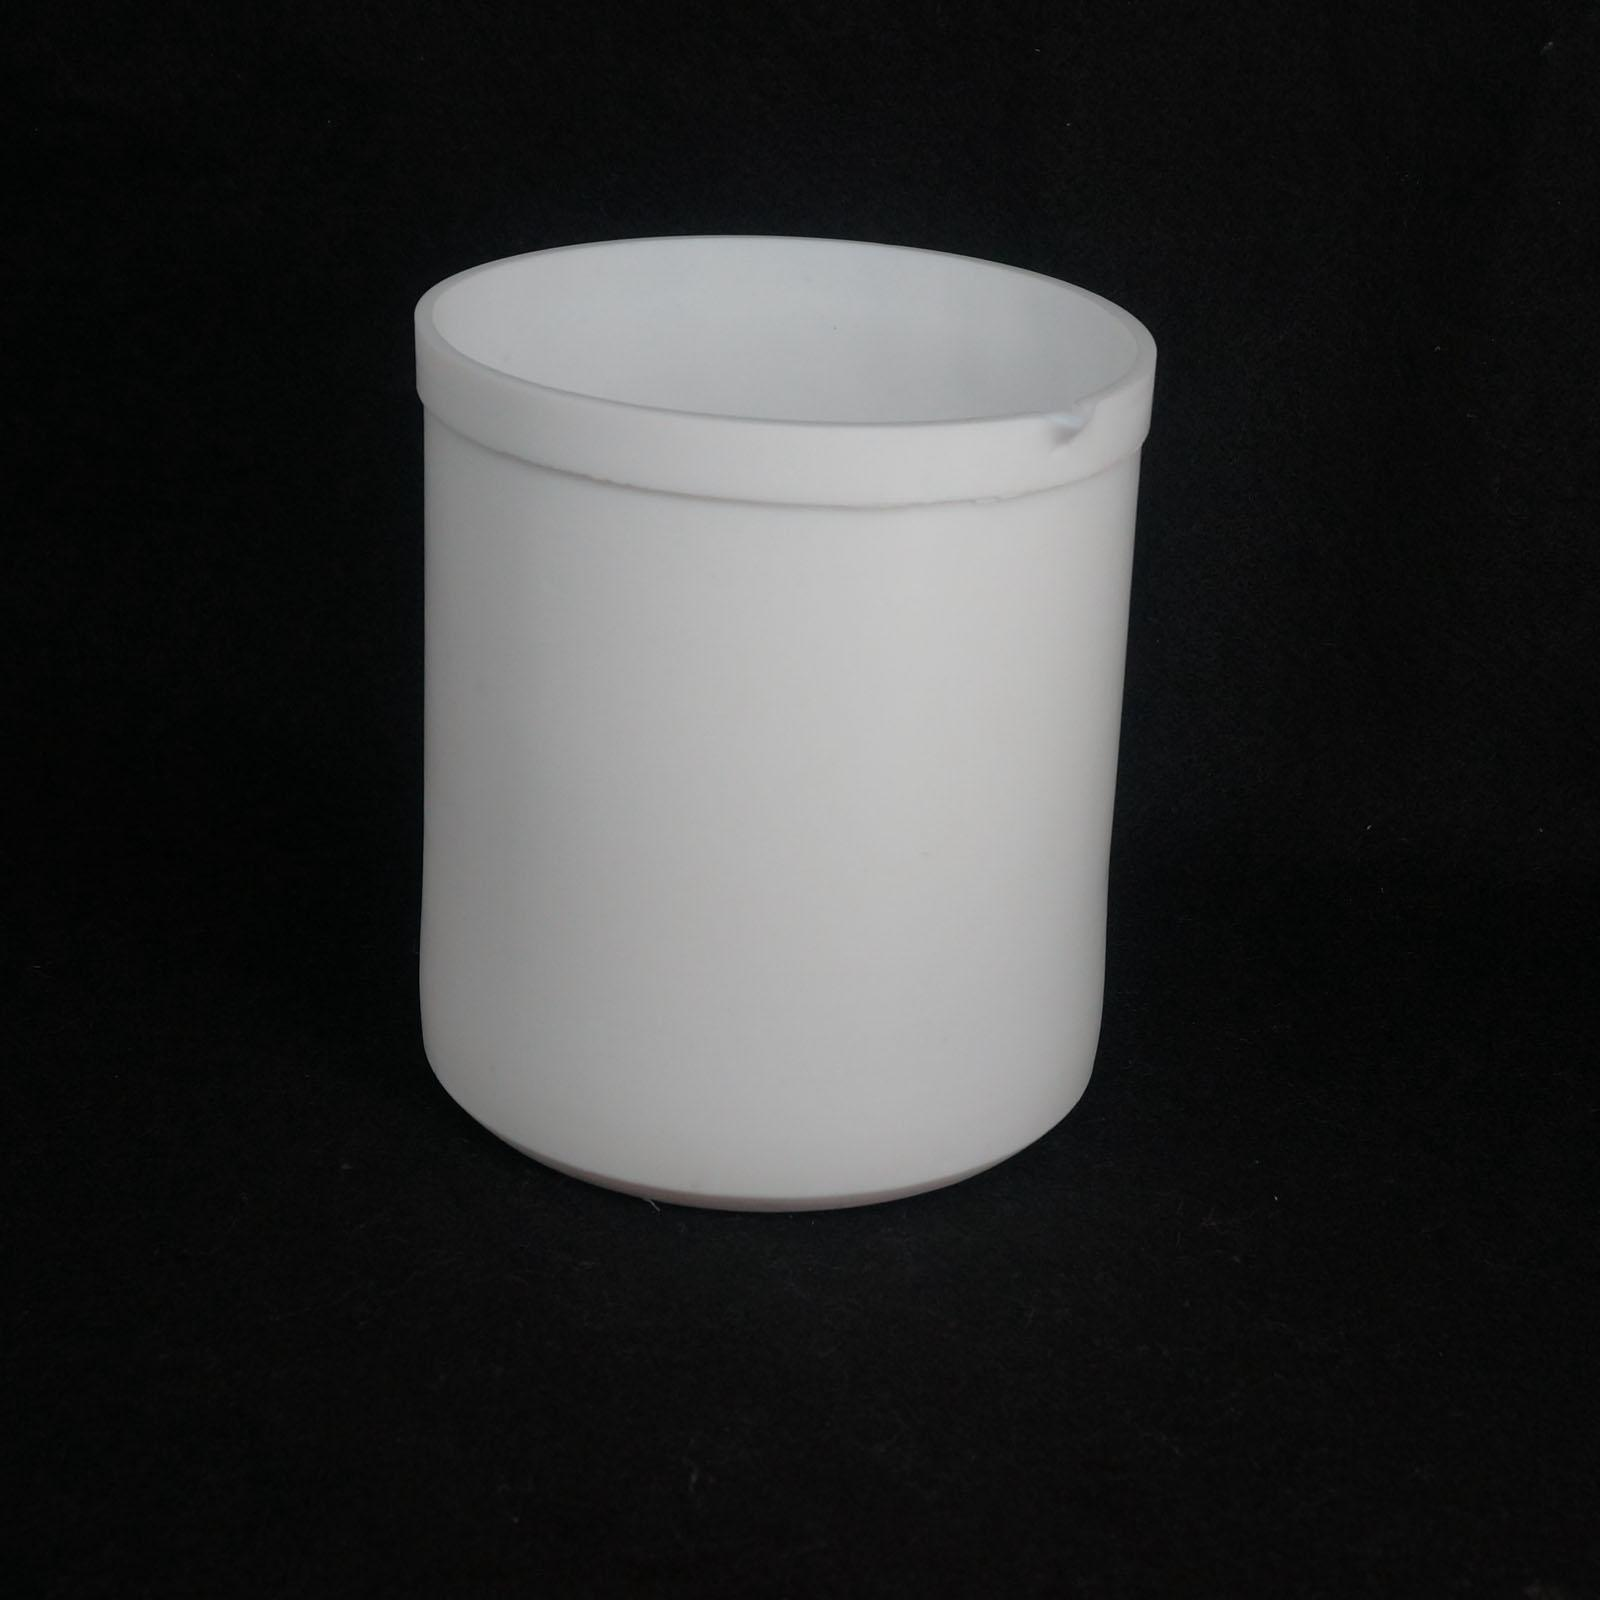 2000ml White Measuring Beaker PTFE Teflon Silicone Laboratory Ware High Quality 200ml ptfe beaker teflon beaker no handle chemical labware